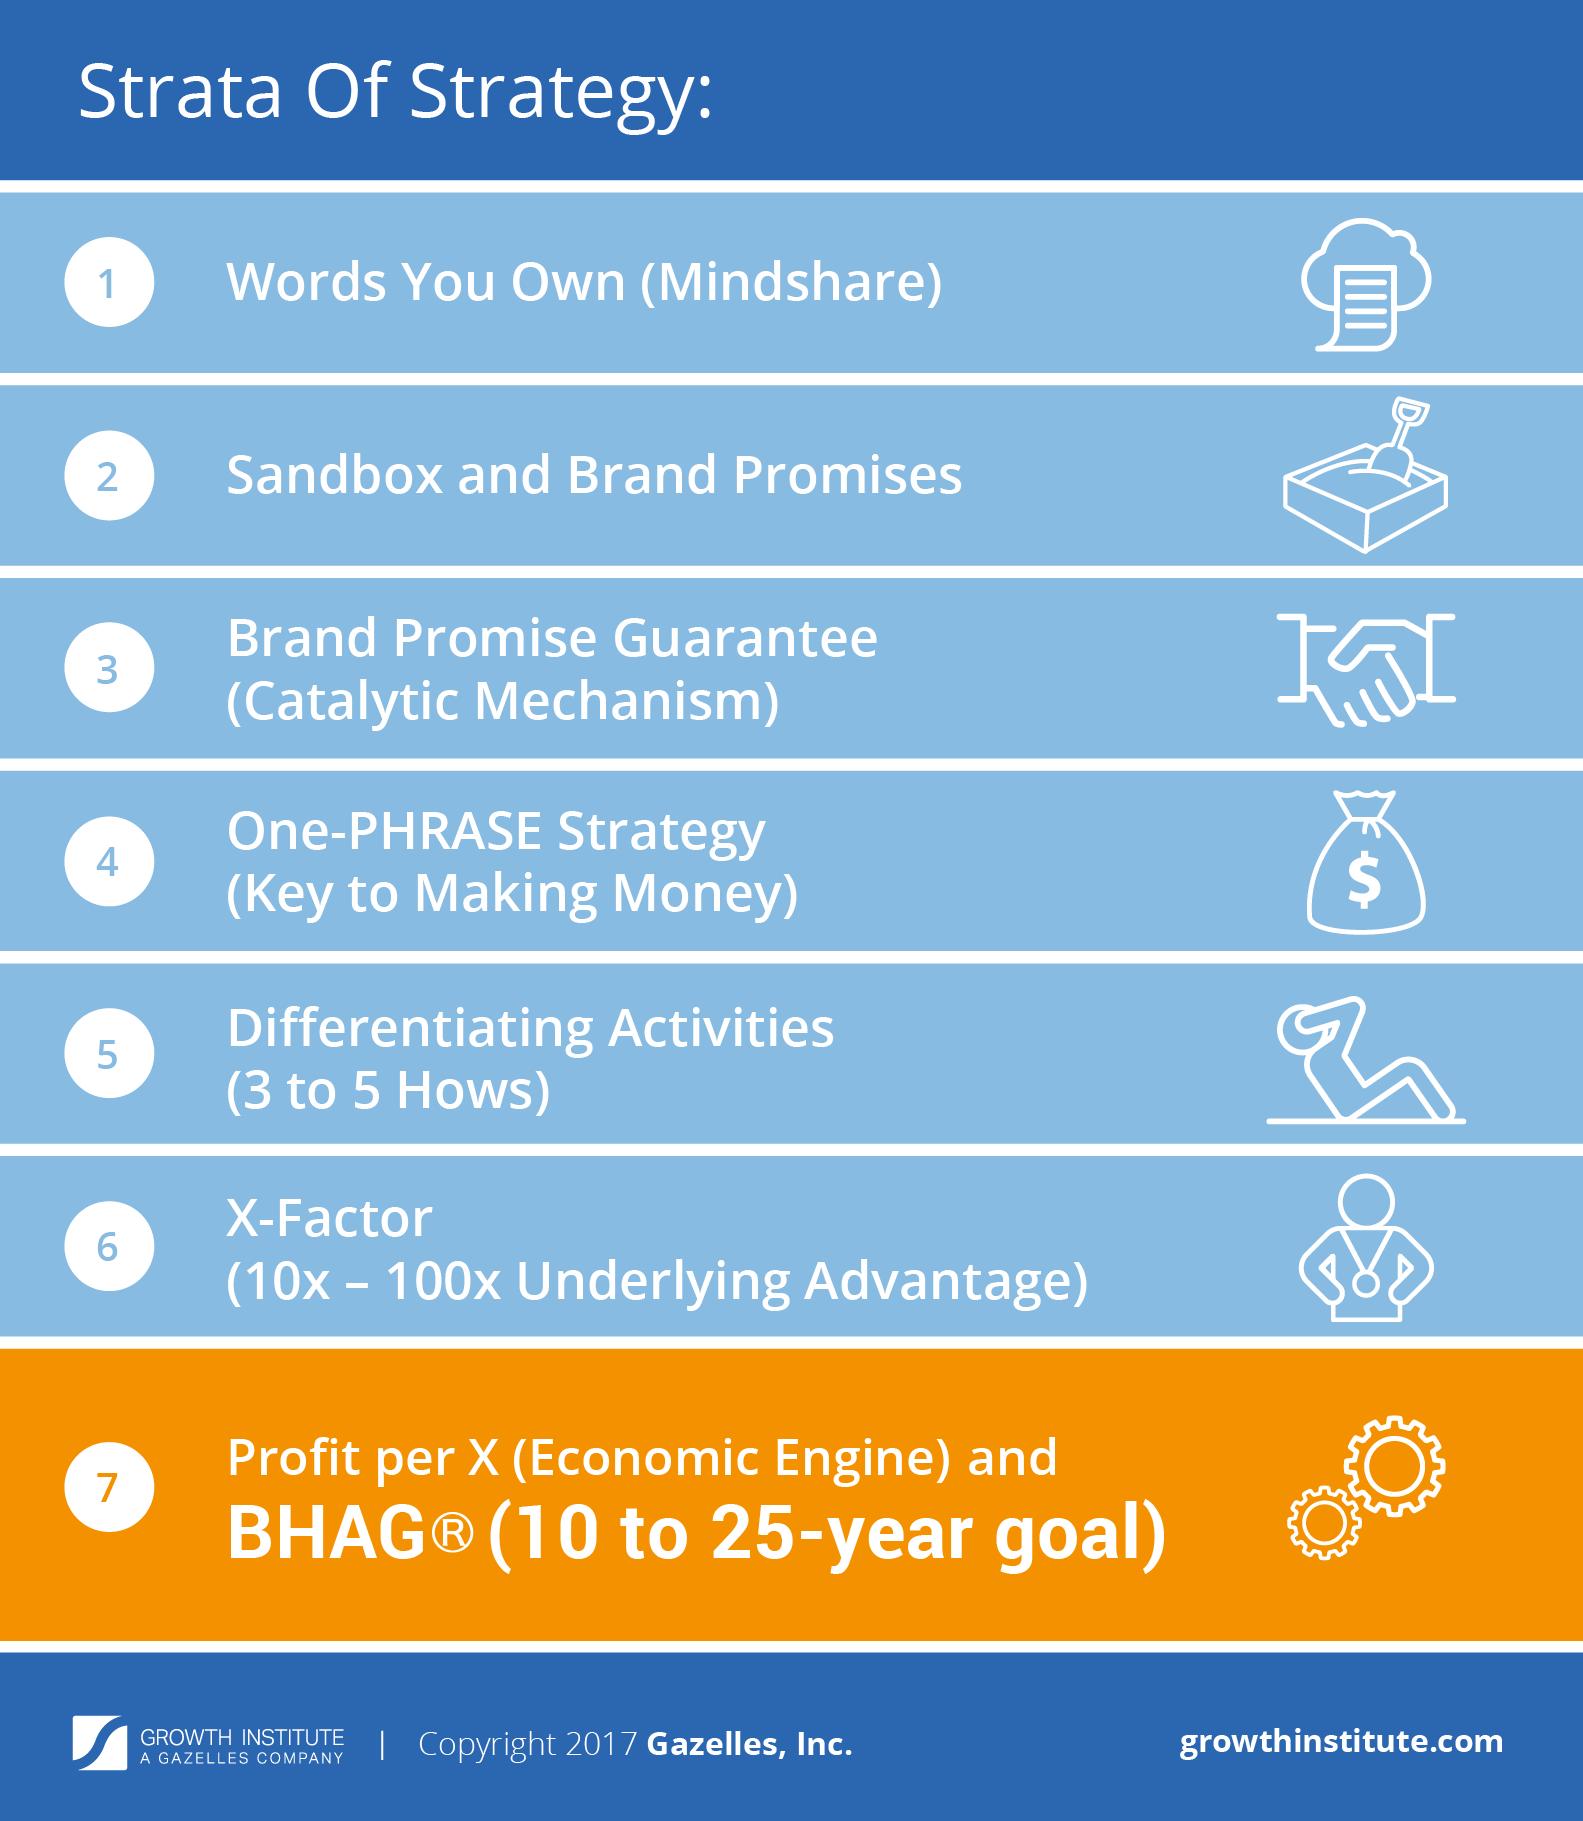 BHAG - Big Hairy Audacious Goal